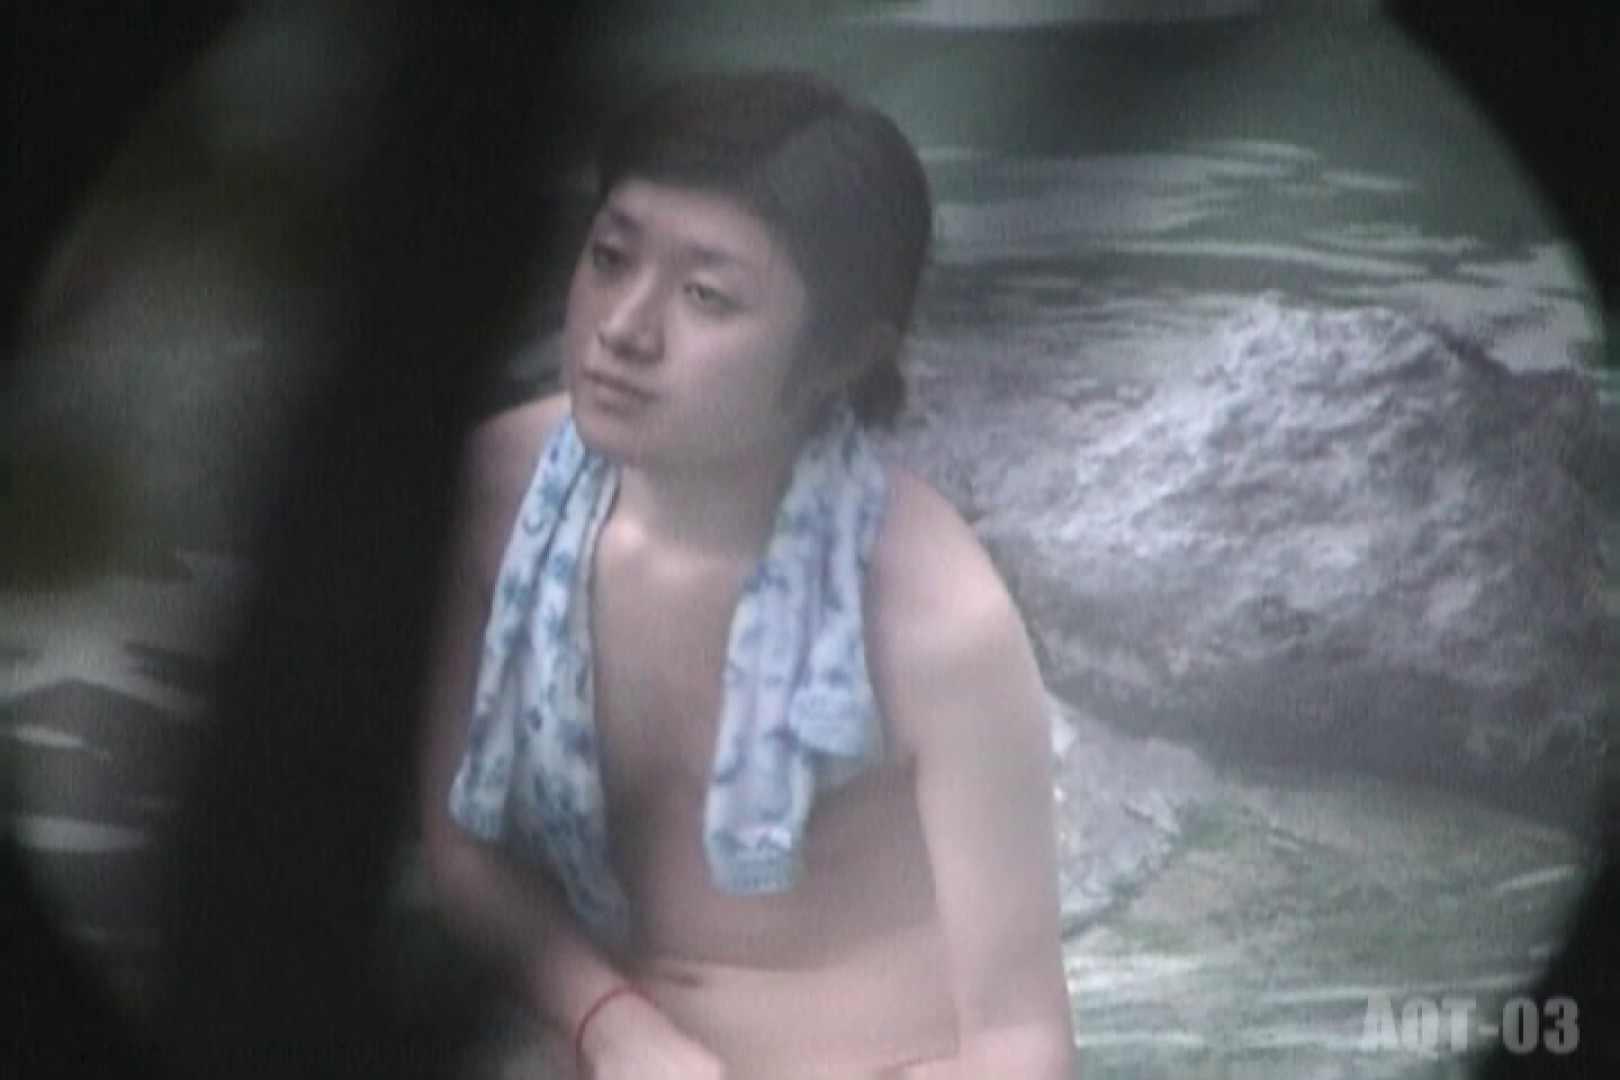 Aquaな露天風呂Vol.736 盗撮 エロ無料画像 60画像 5